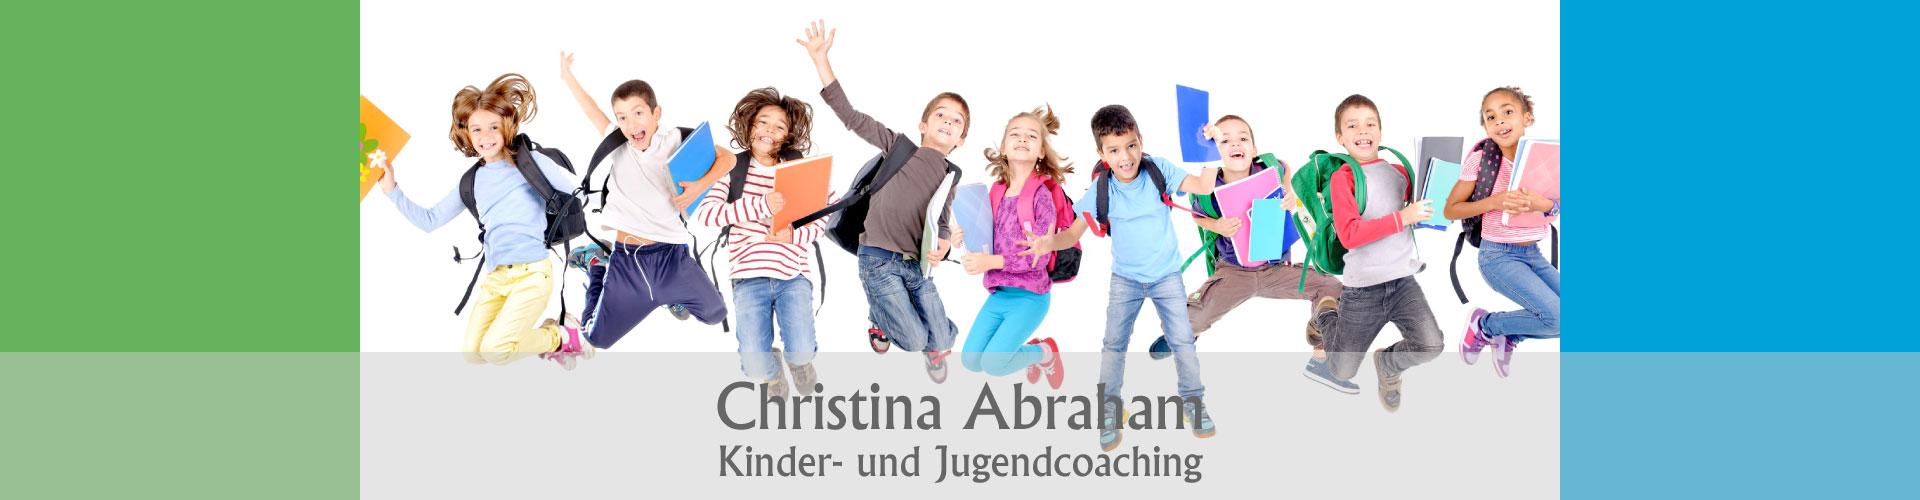 Kindercoaching Christina Abraham